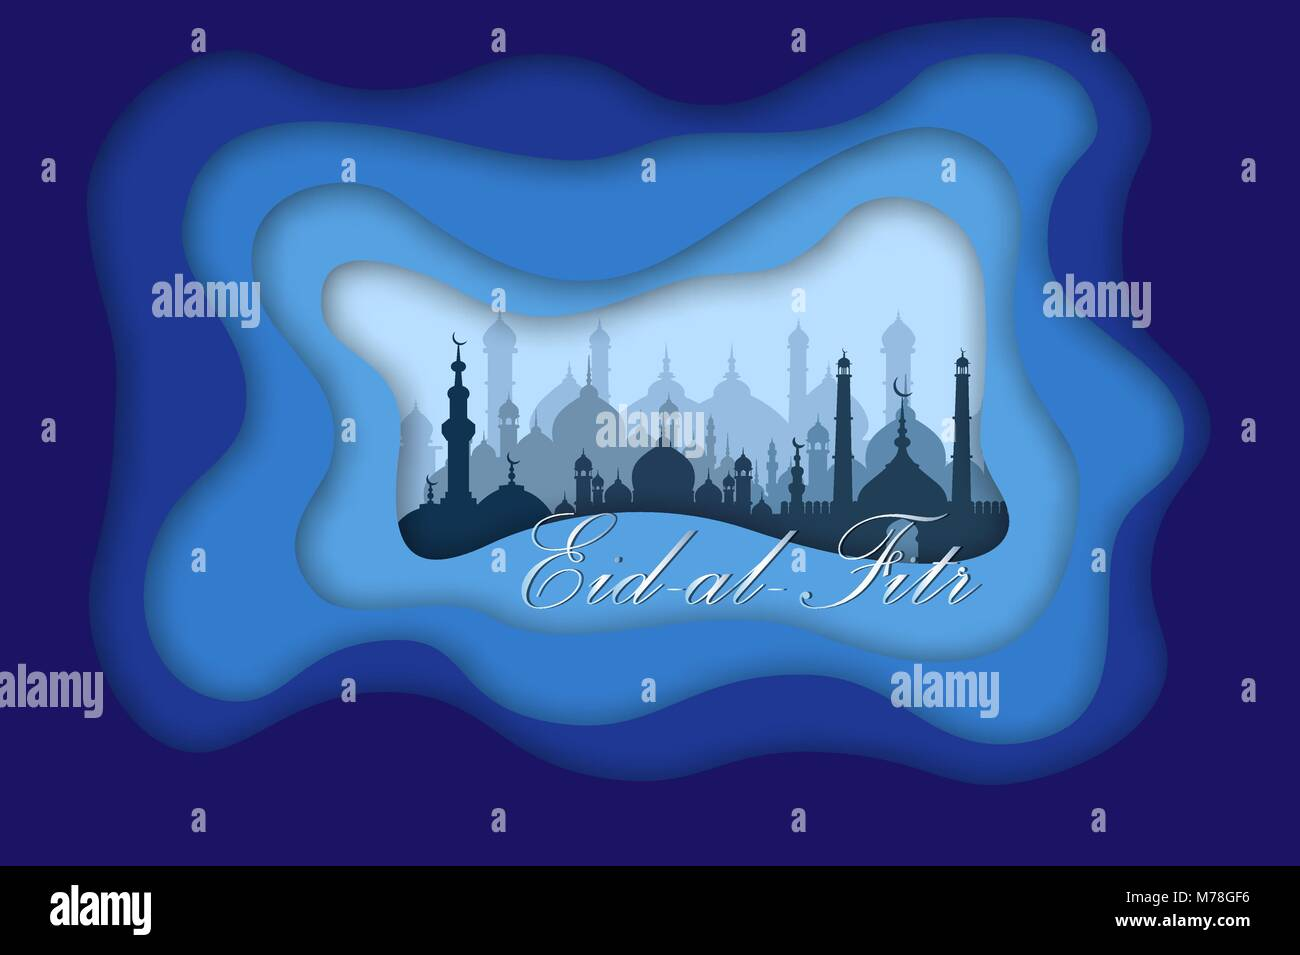 Eid al fitr mubarak greeting card vector illustration stock vector eid al fitr mubarak greeting card vector illustration m4hsunfo